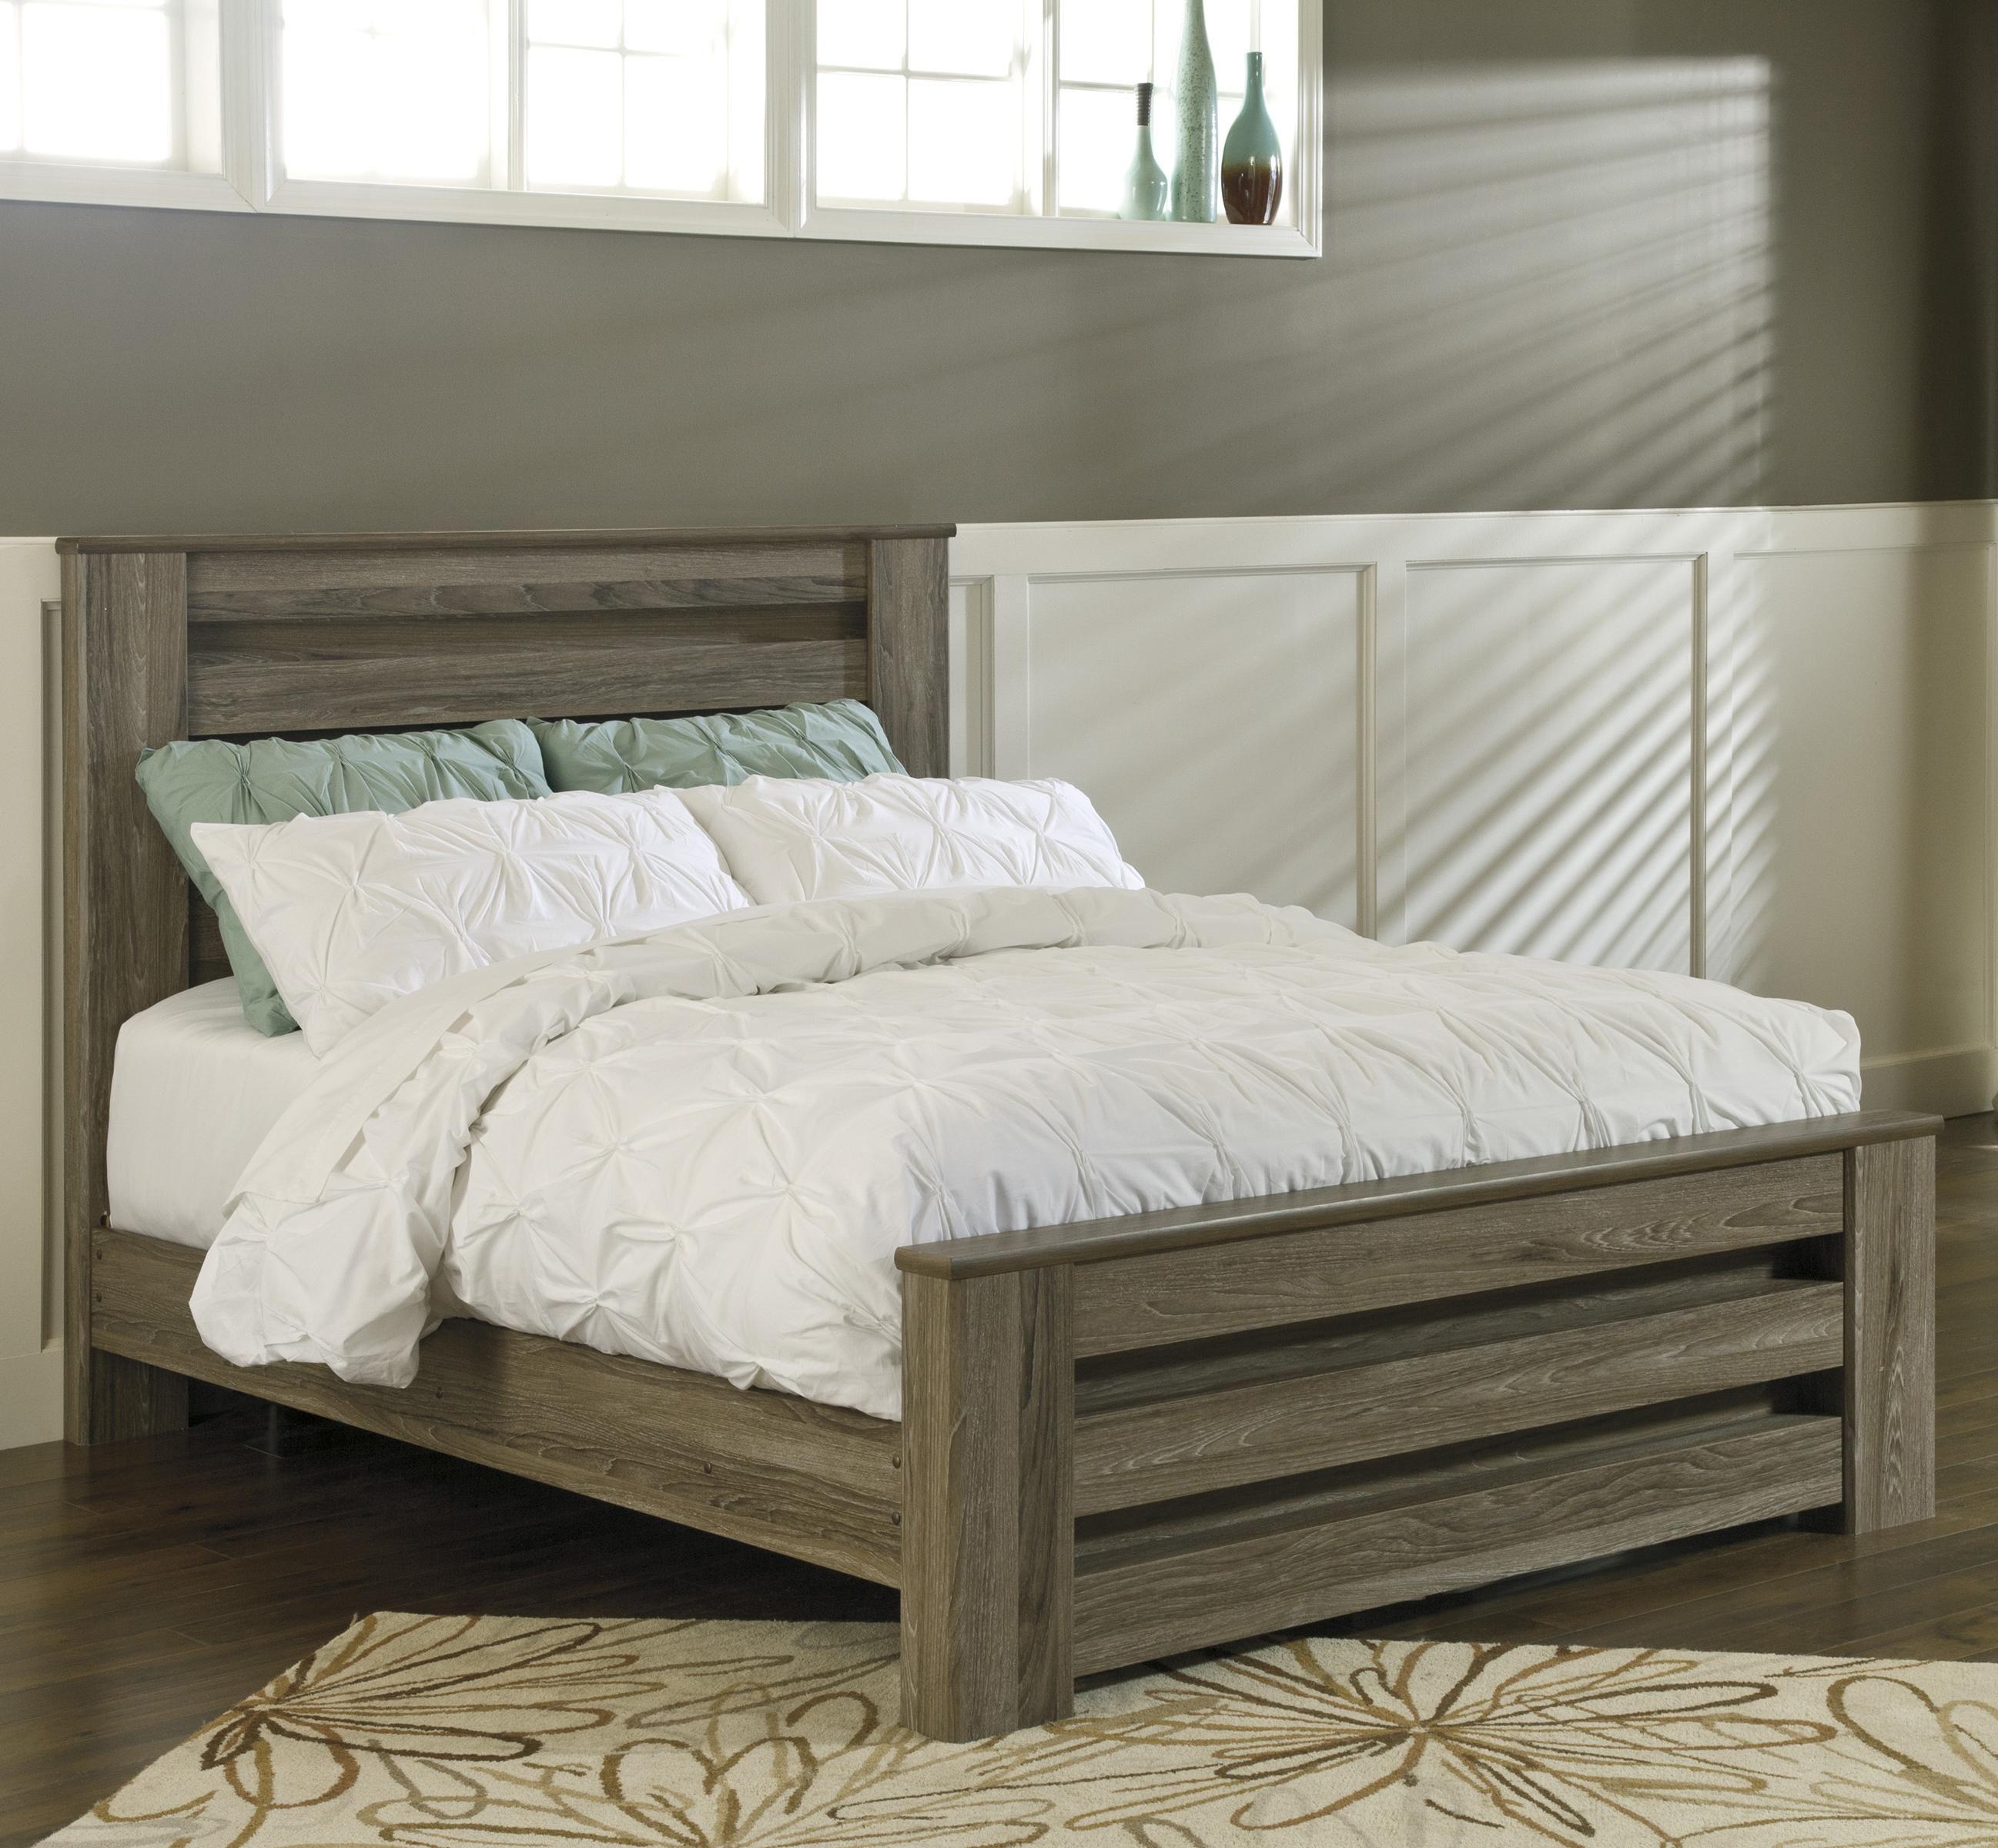 zelen queen poster bed in warm gray rustic finish by signature rh pinterest com